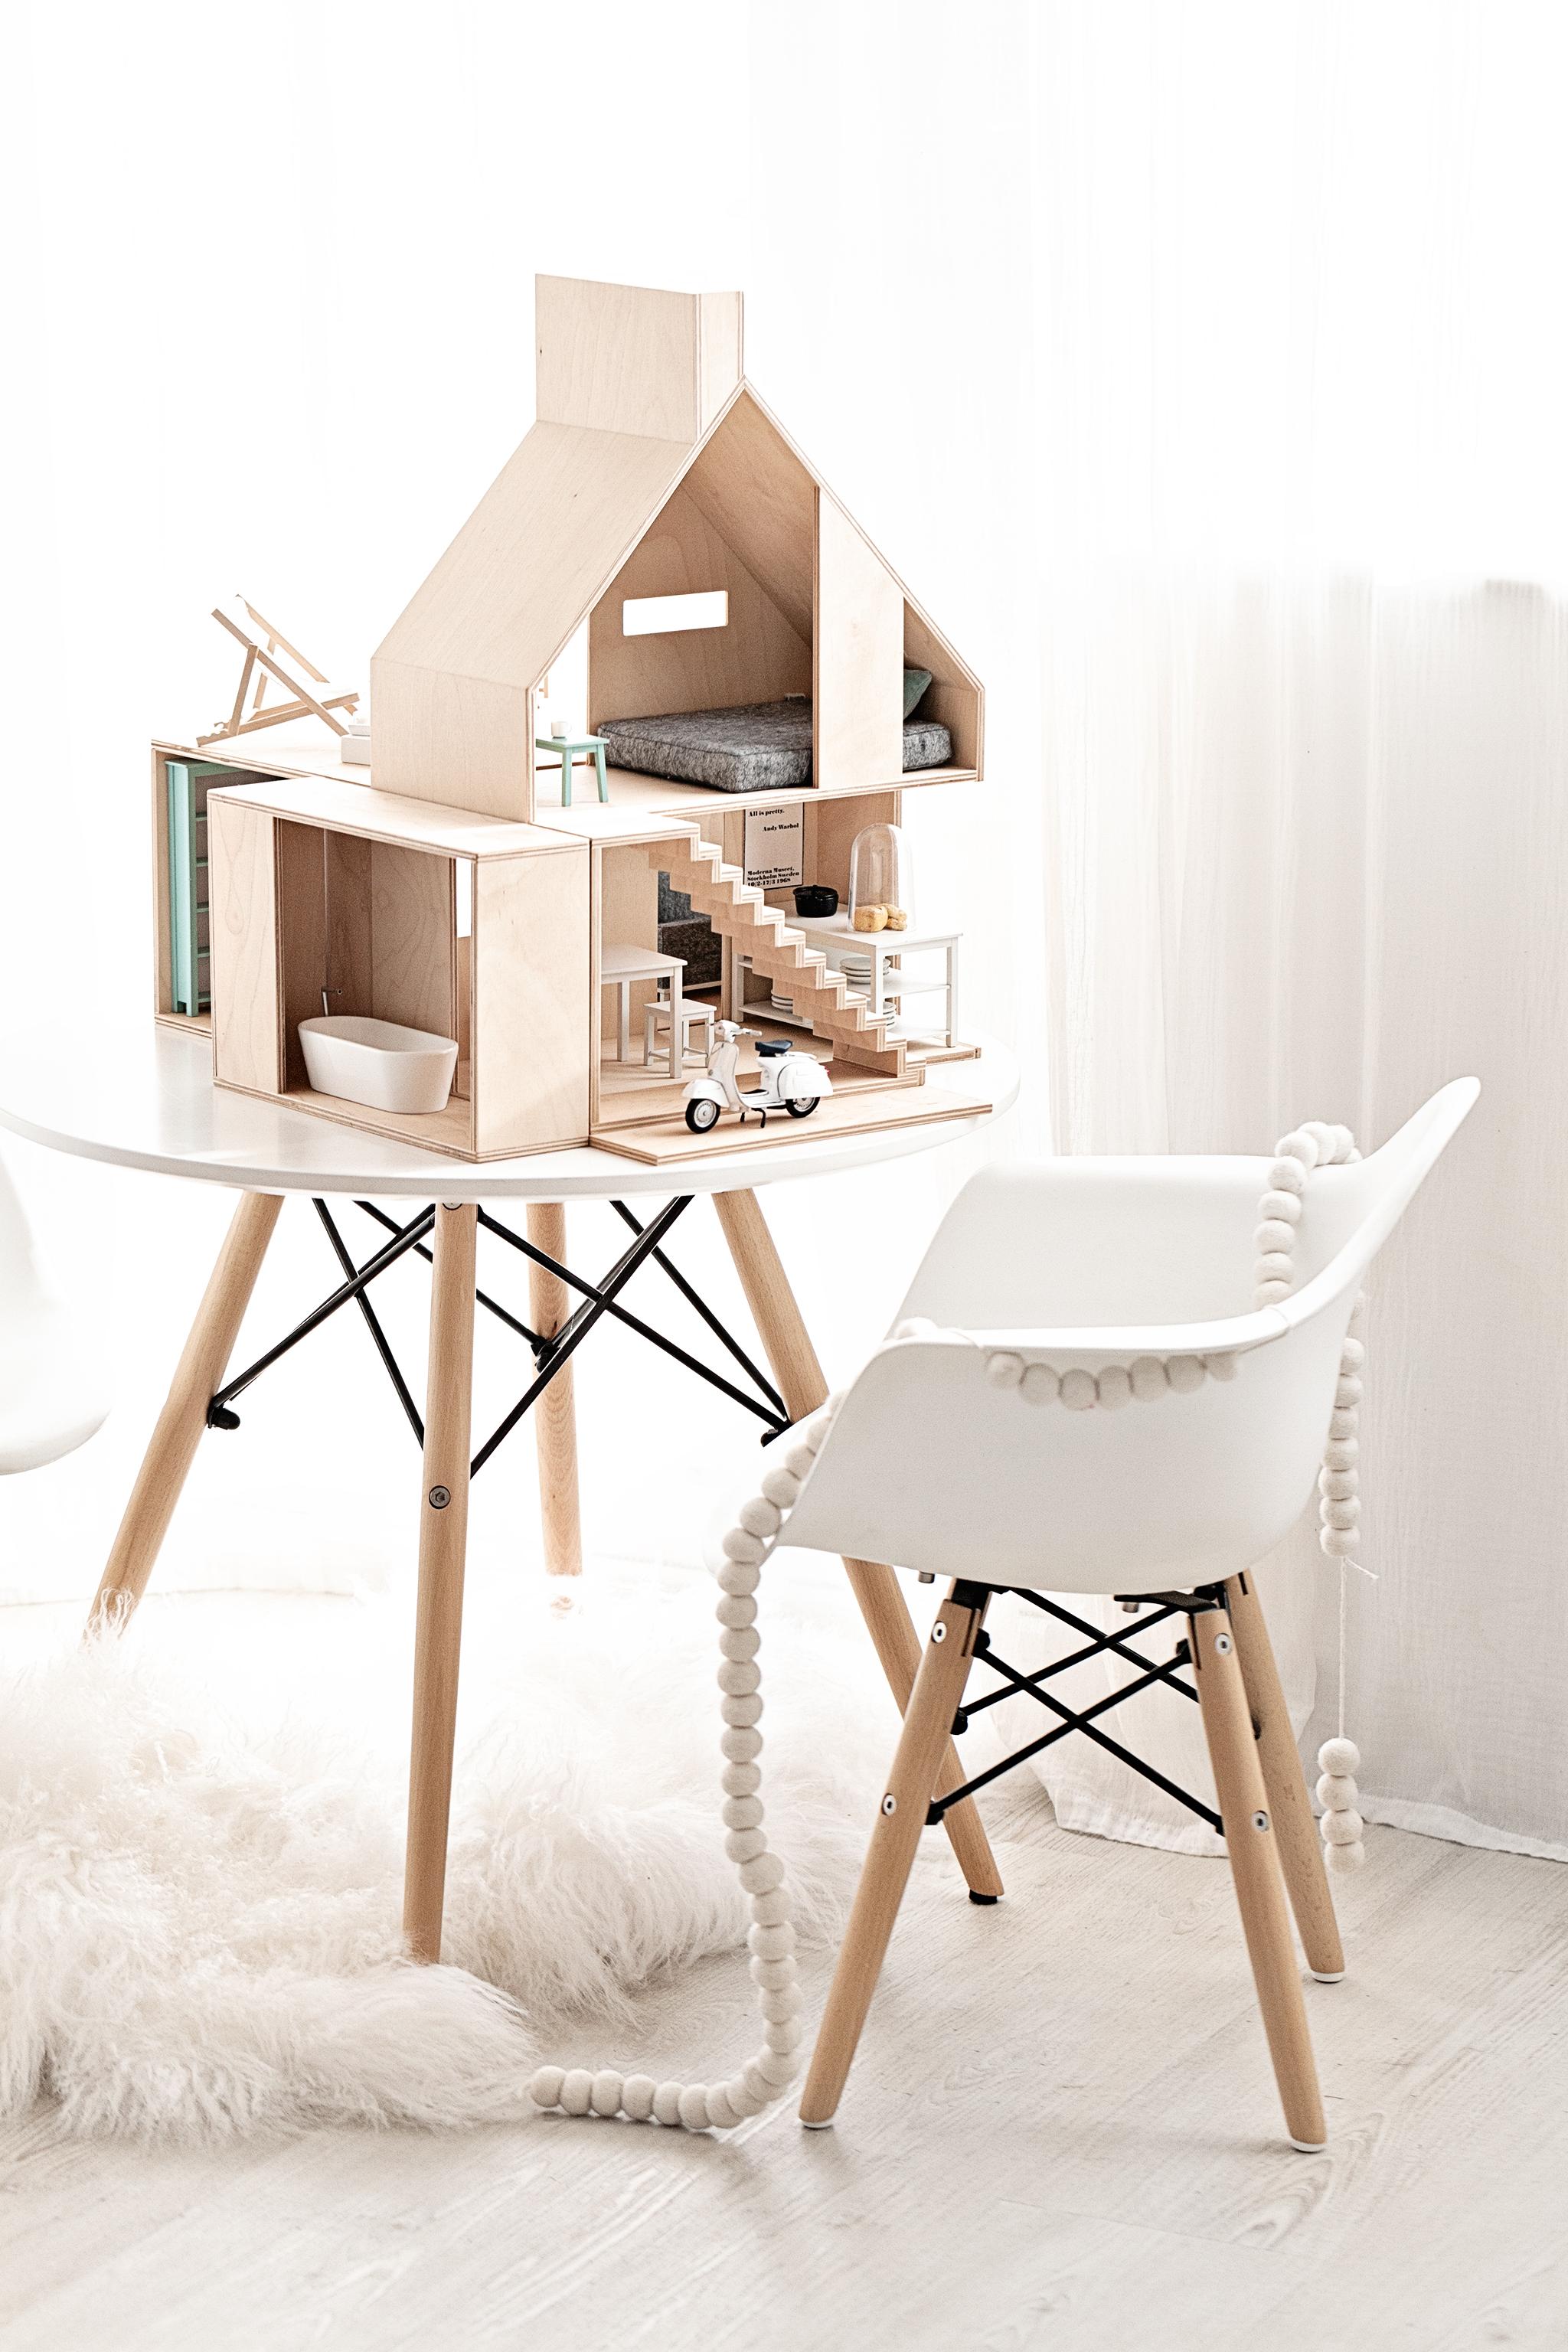 Dollhouse & Furnitures from  Boomini Dollhouses | White Mongolian Sheepskin Rug from  Milabert